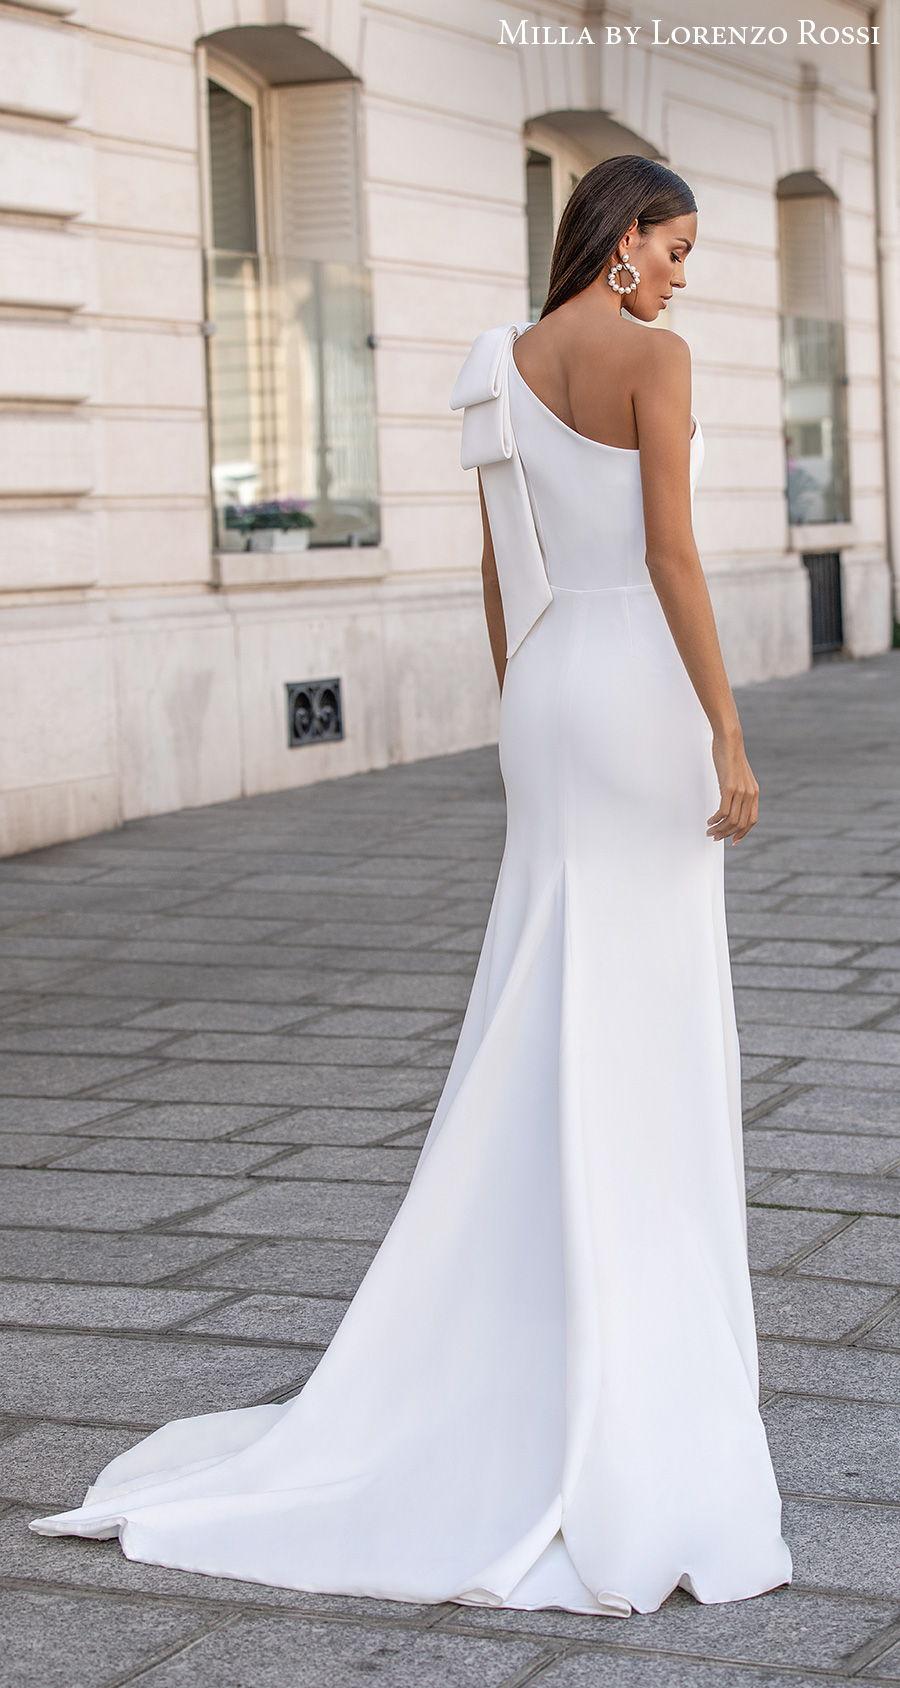 milla lorenzo rossi 2021 bridal one shoulder ribbon strap simple minimalist elegant fit and flare wedding dress medium train (amandine) bv